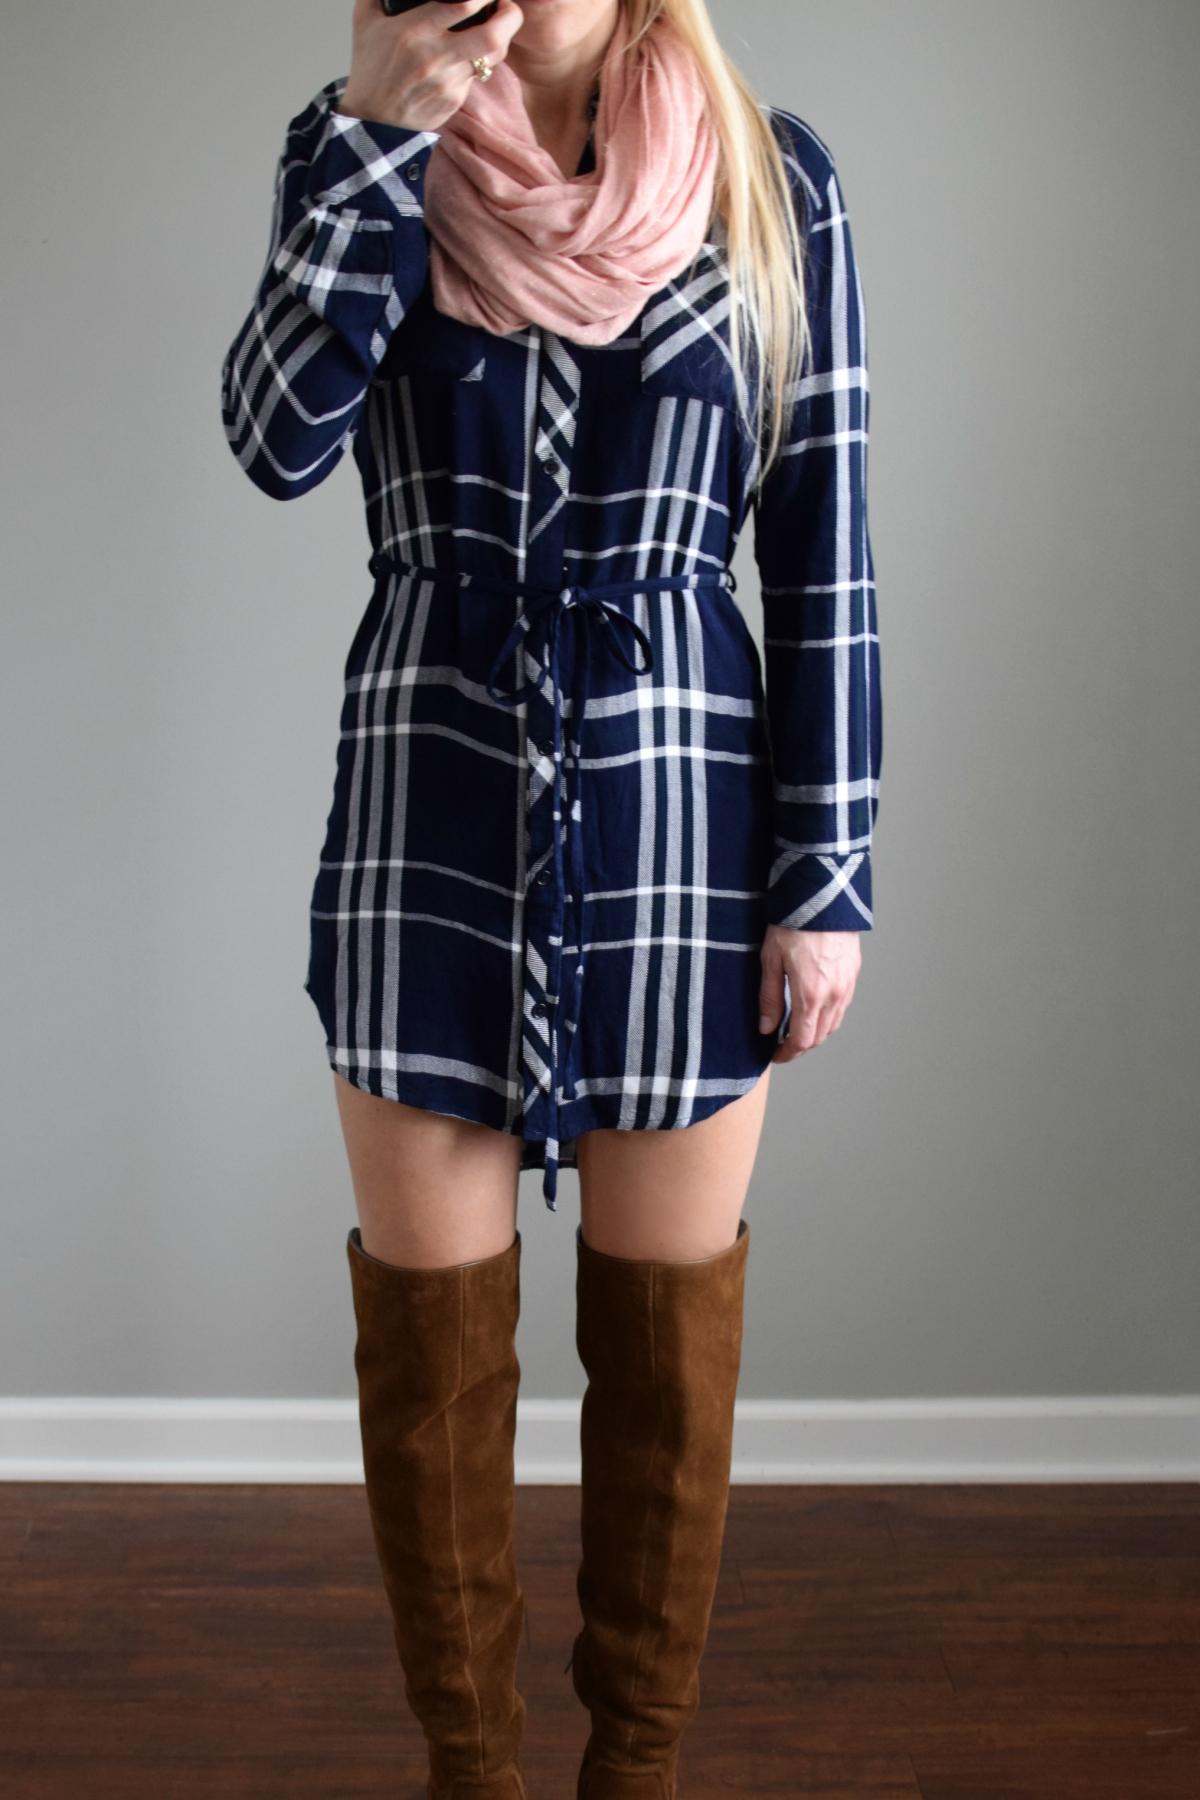 Stitch Fix Review February 2017: Rails Shar Button Down Dress |www.pearlsandsportsbras.com|